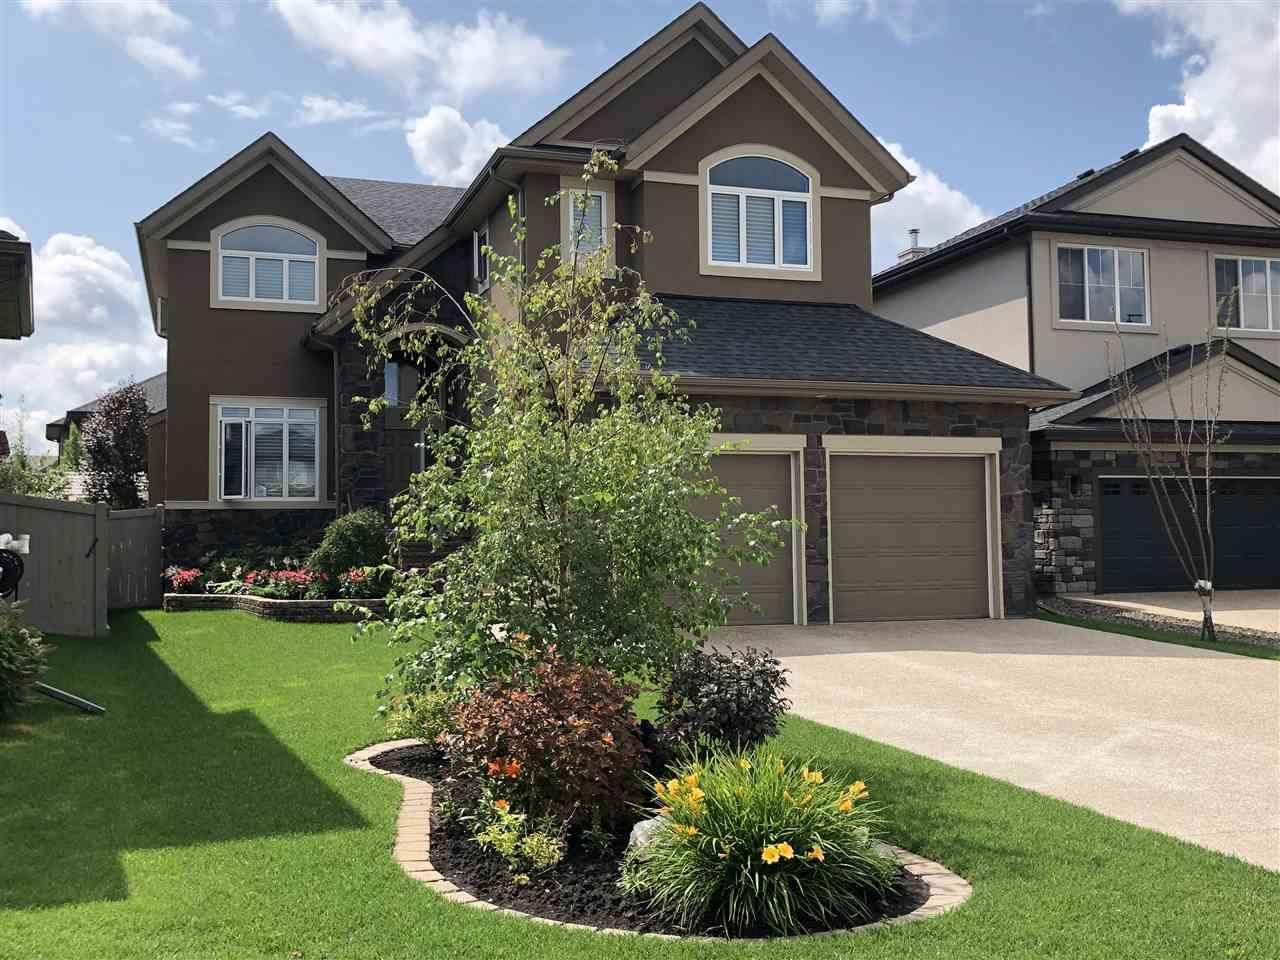 House for sale at 2813 Watcher Ct Sw Edmonton Alberta - MLS: E4175920